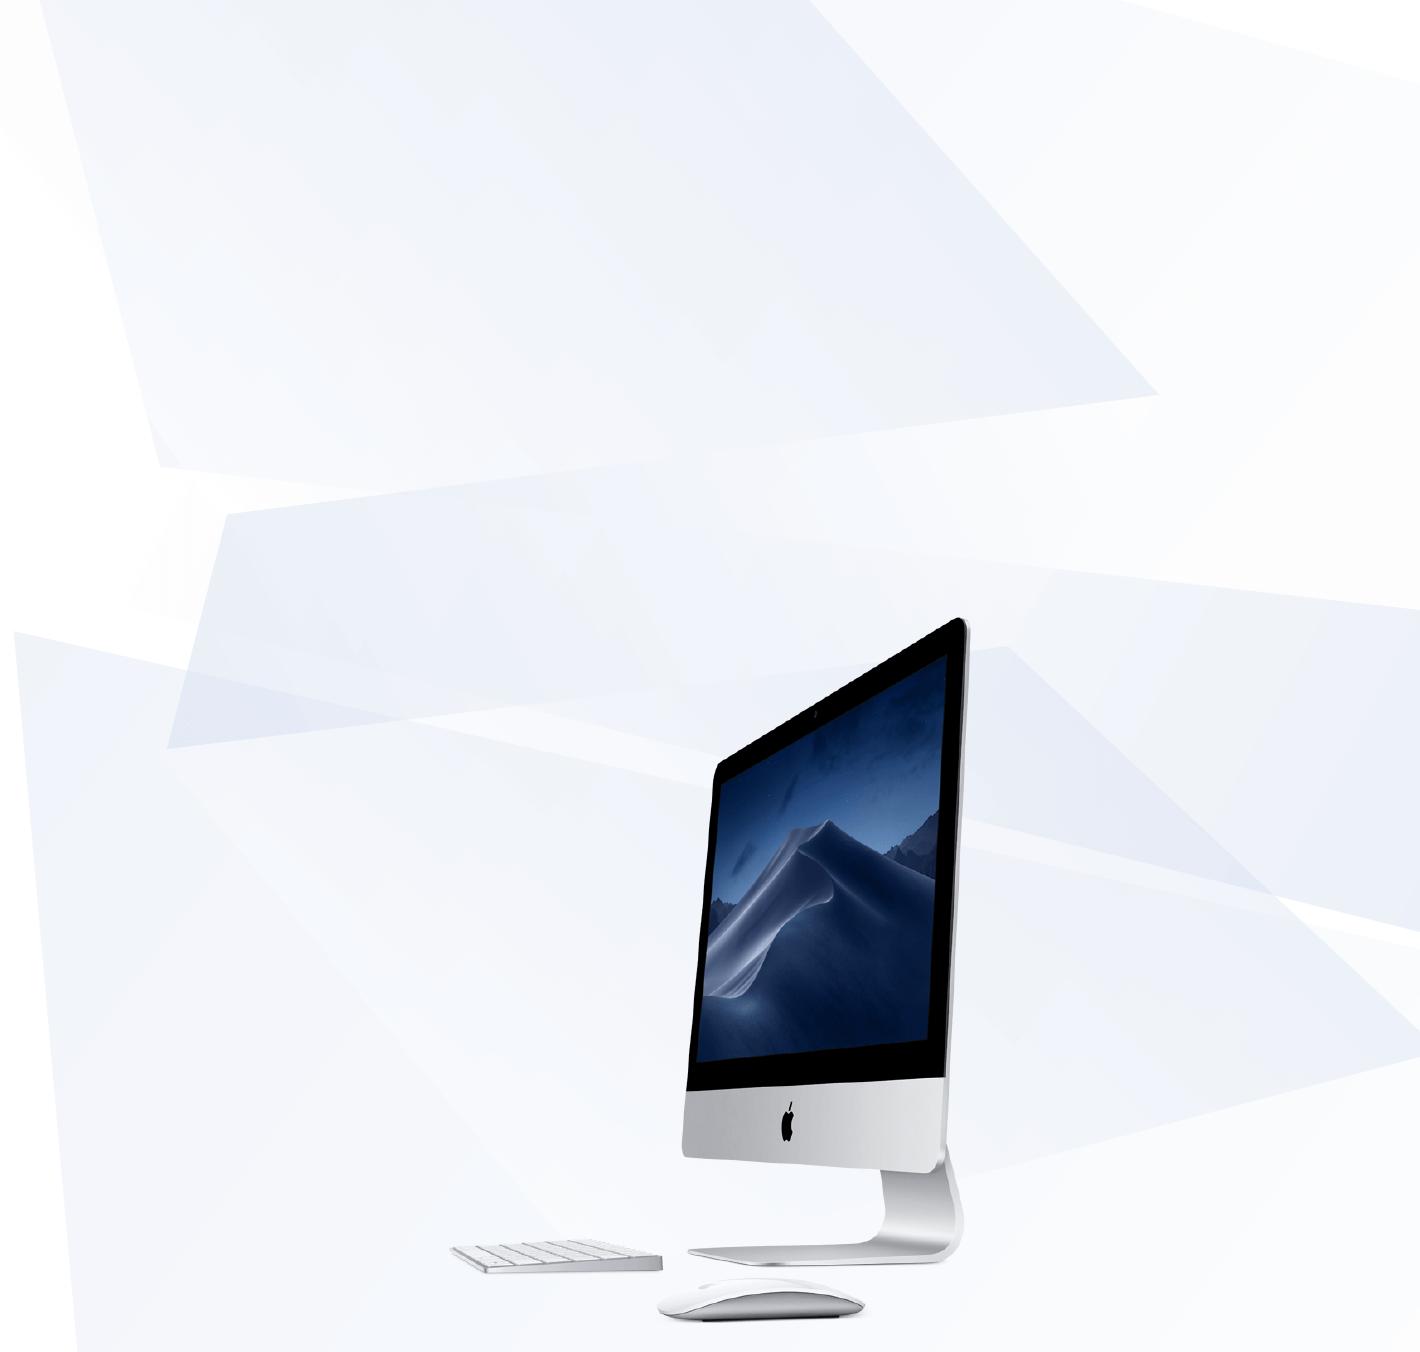 iMac info (2019) 1